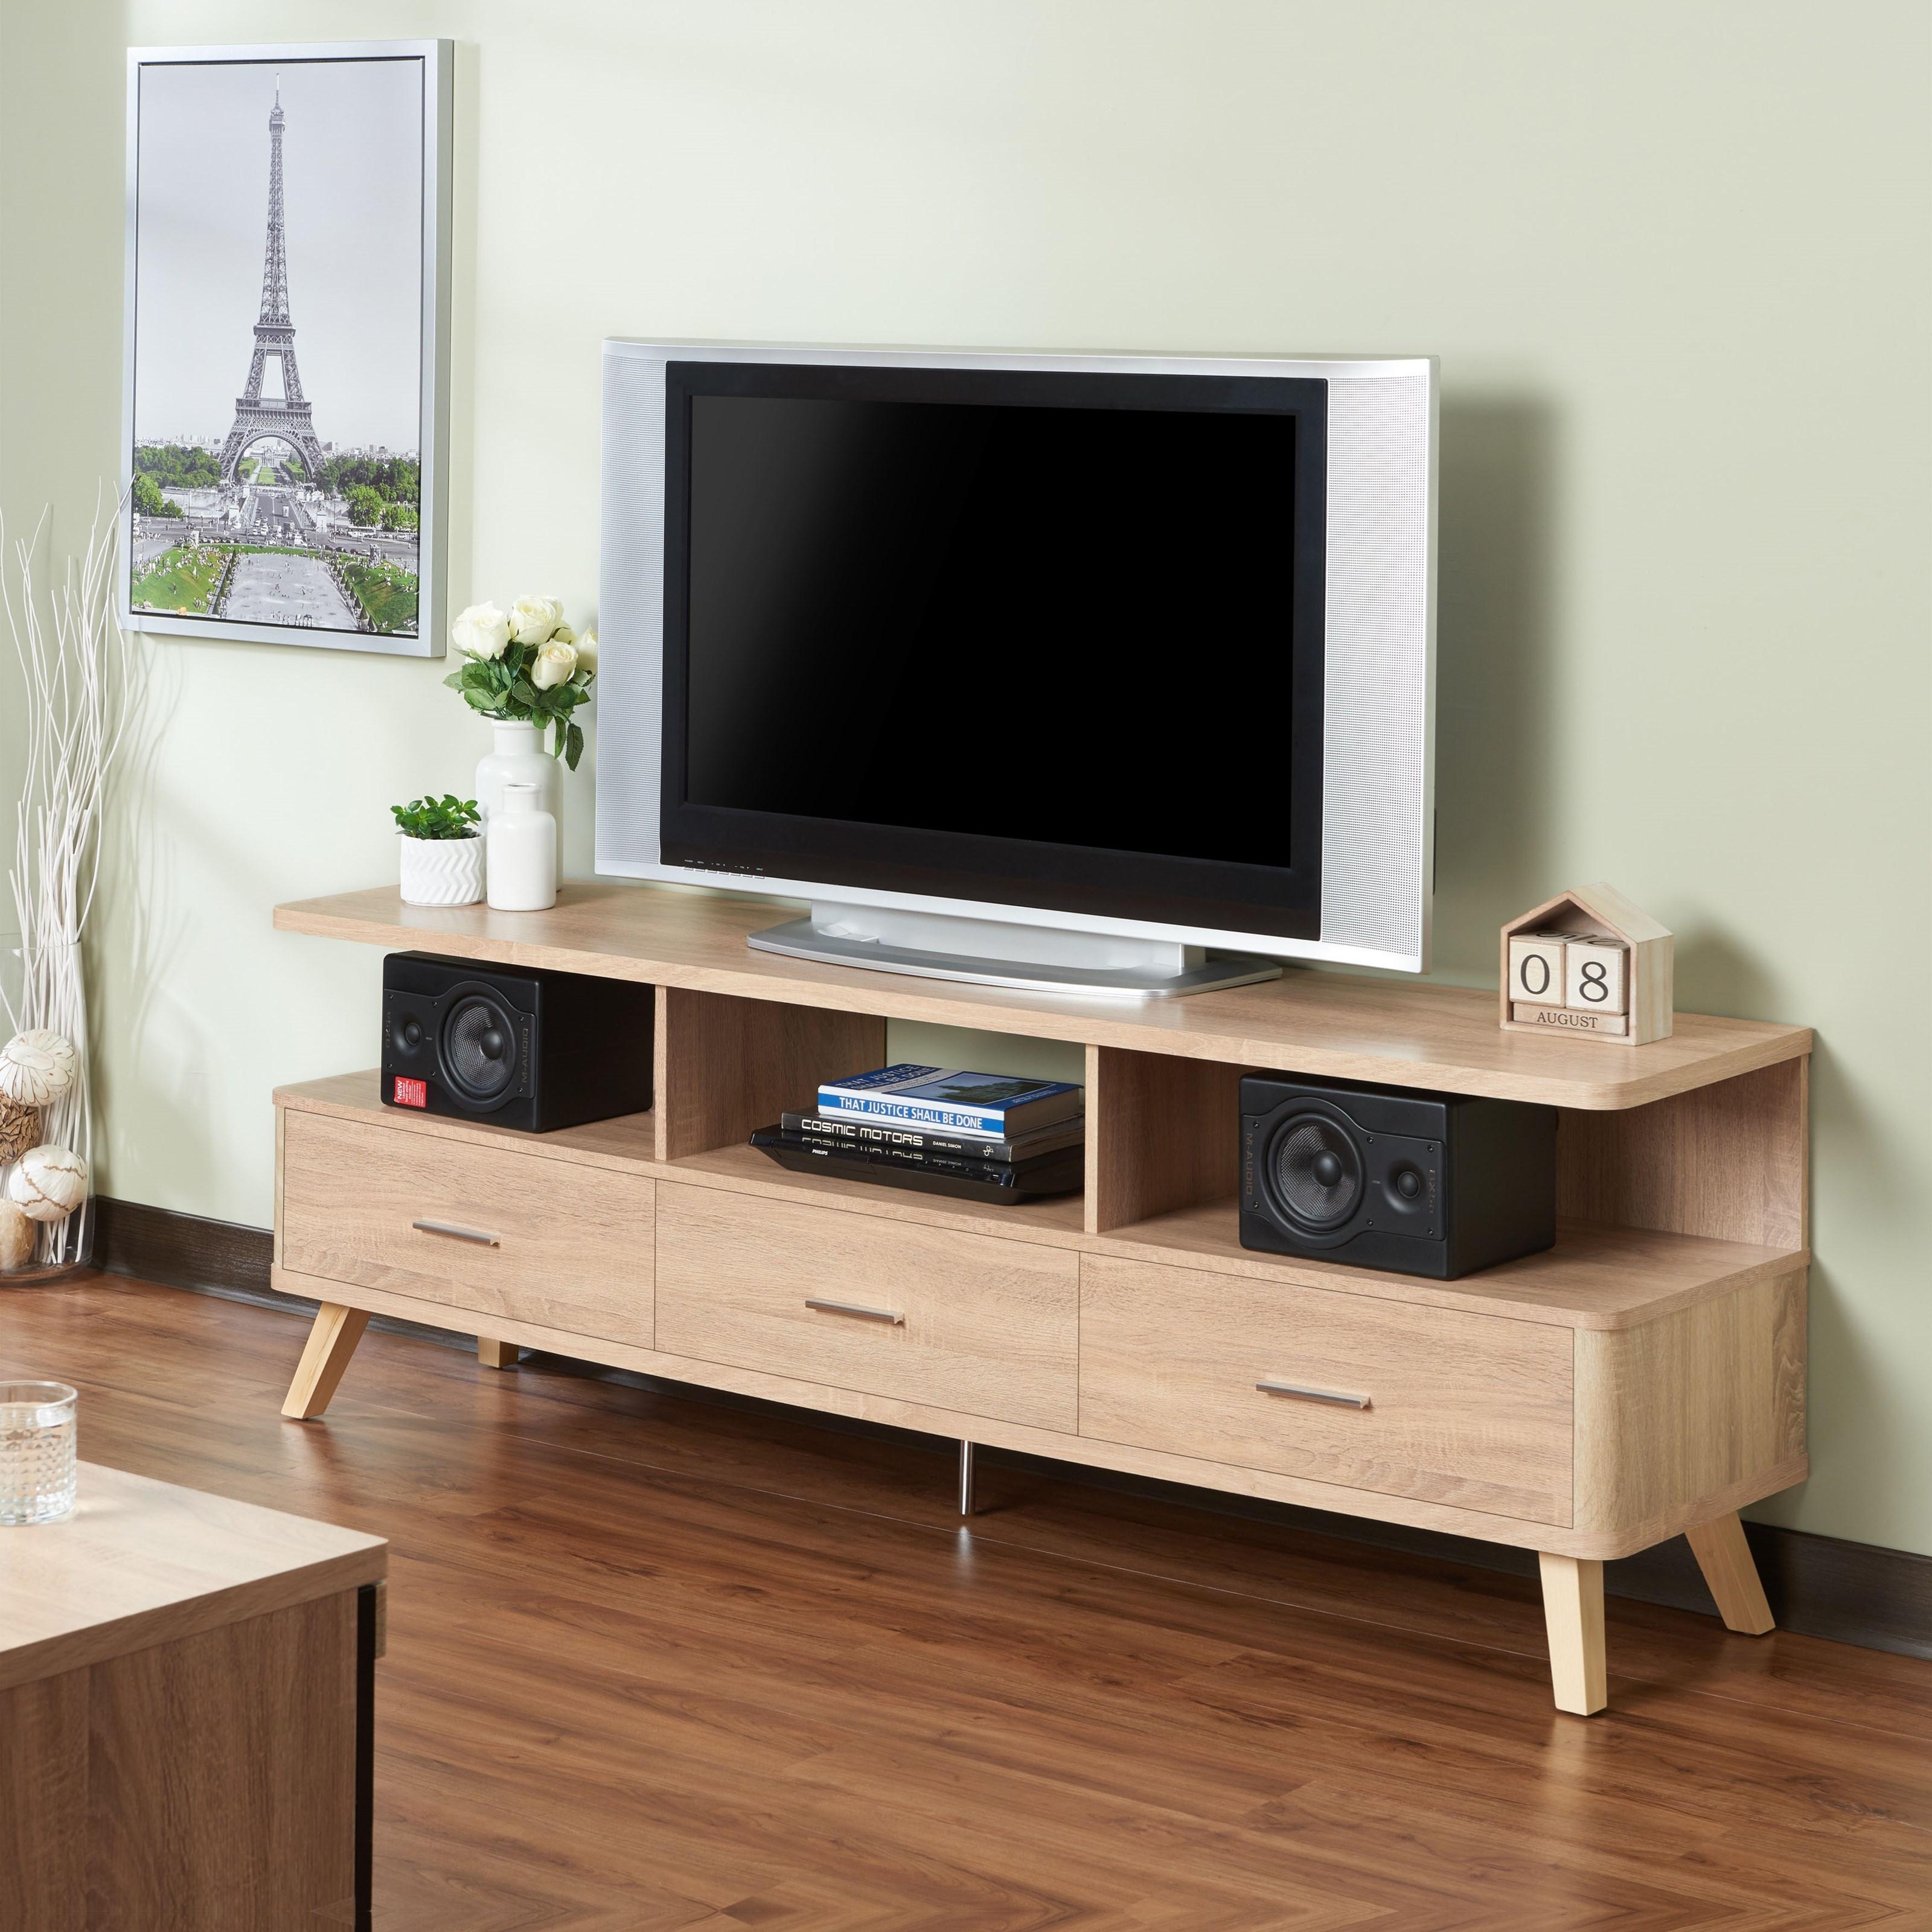 Lakin TV Stand by Acme Furniture at Carolina Direct